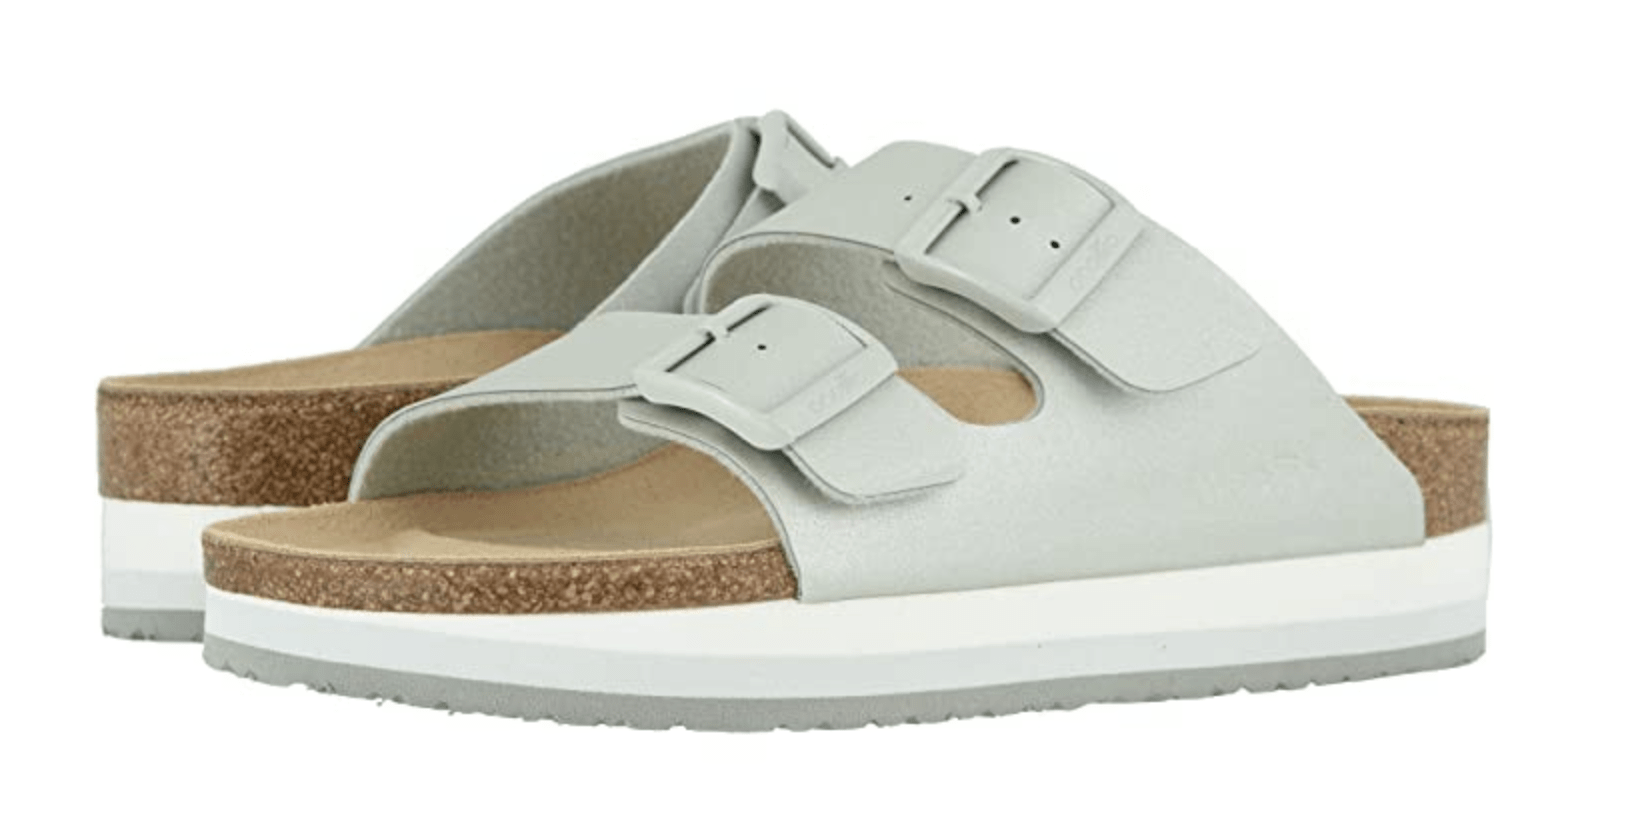 Birkenstock Arizona Womens shoes